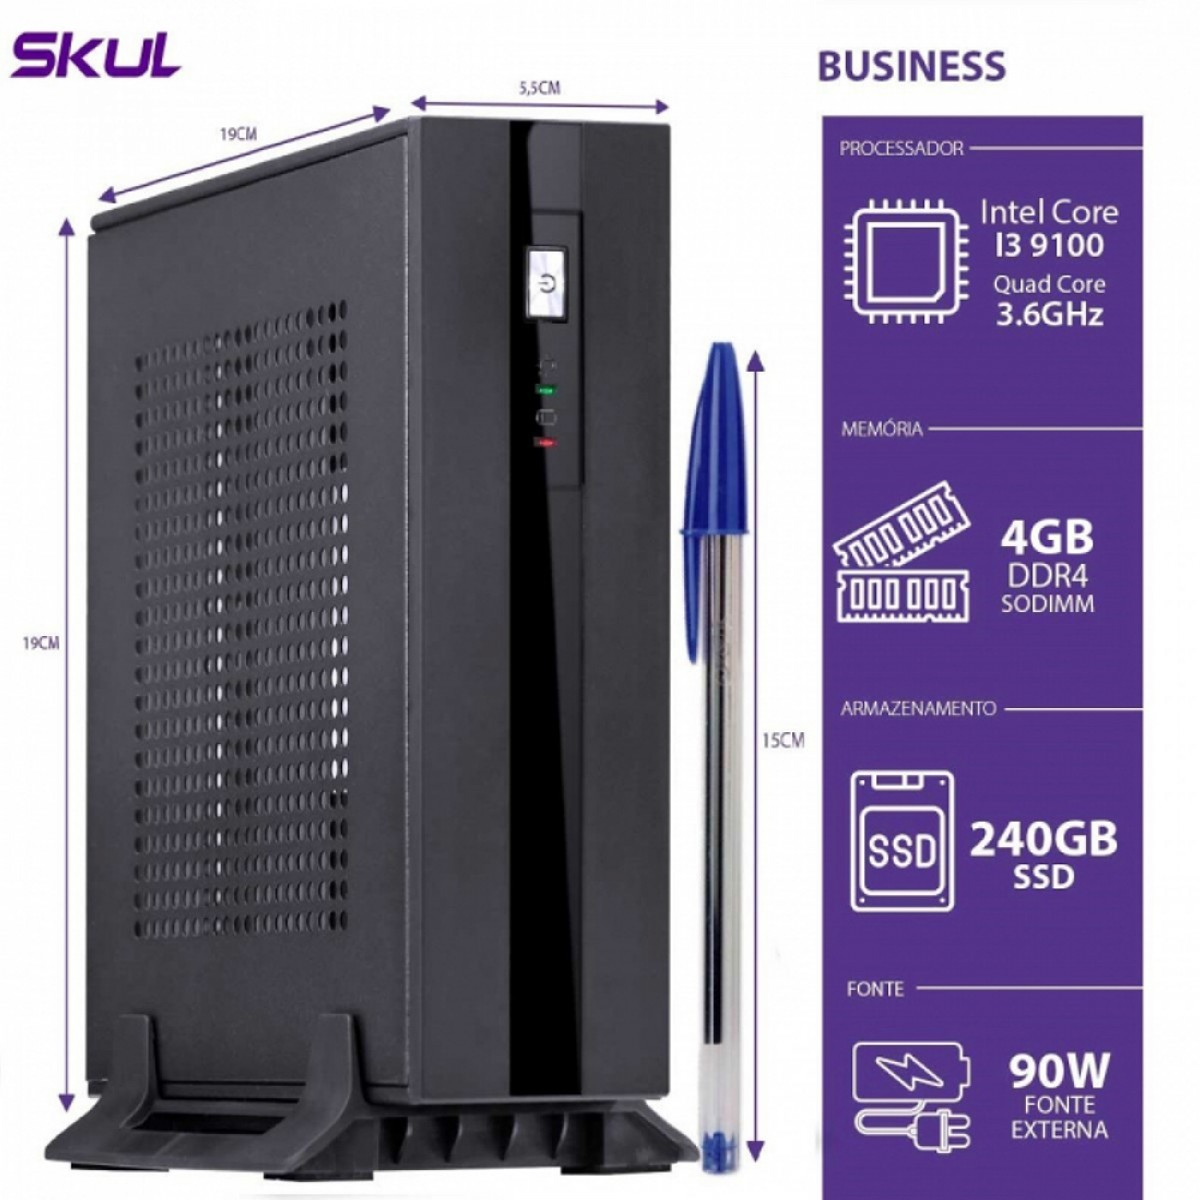 Computador Skul T-Home Business B300 i3 9100 / 4GB DDR4 SODIMM / SSD 240GB / HDMI/DP / FONTE EXTERNA 90W